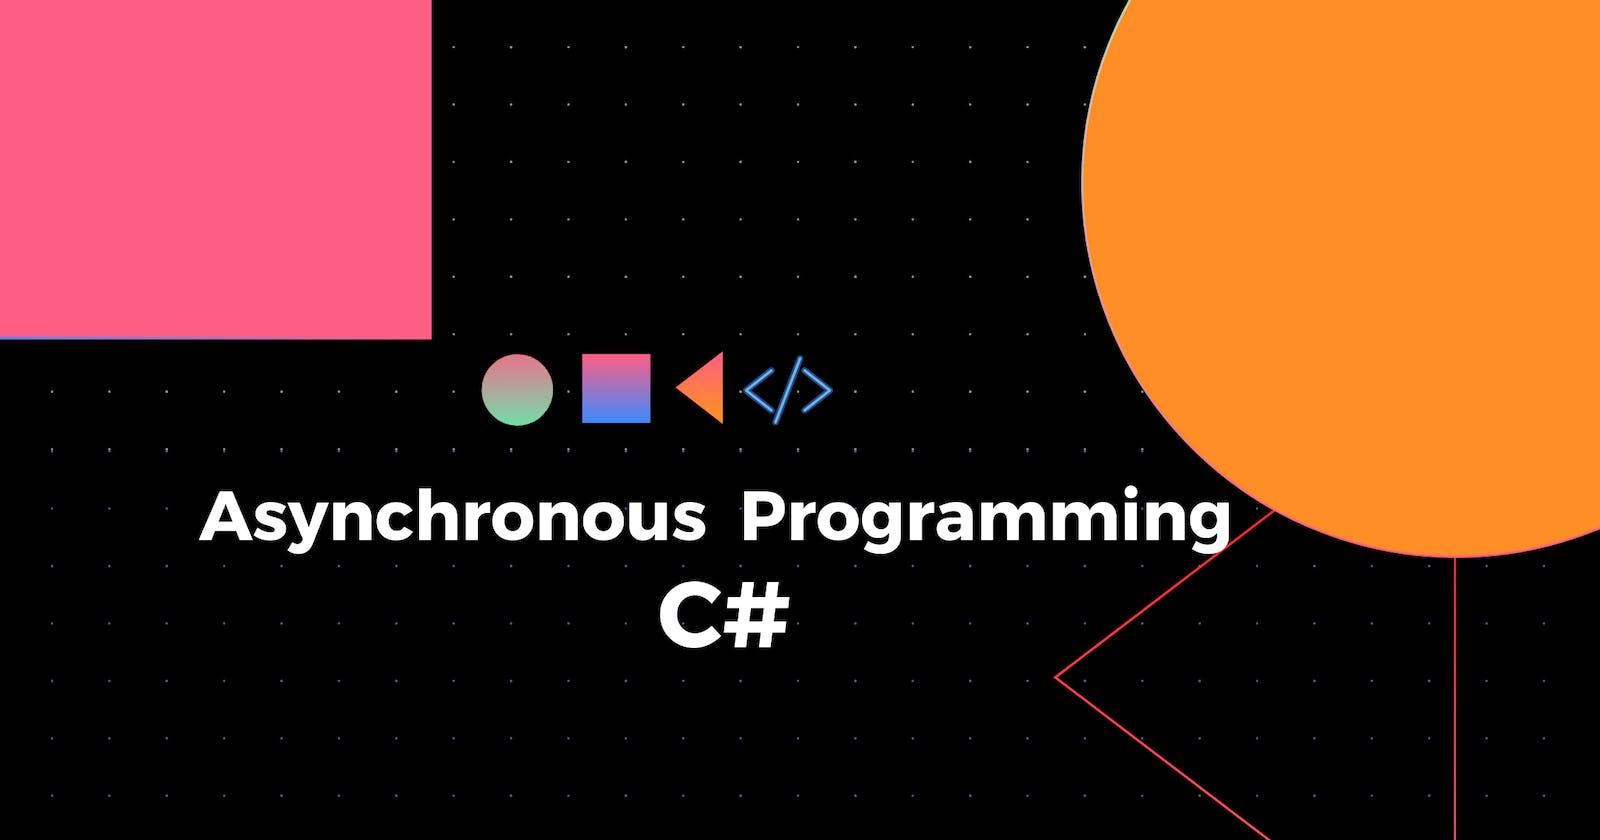 Asynchronous programming 101